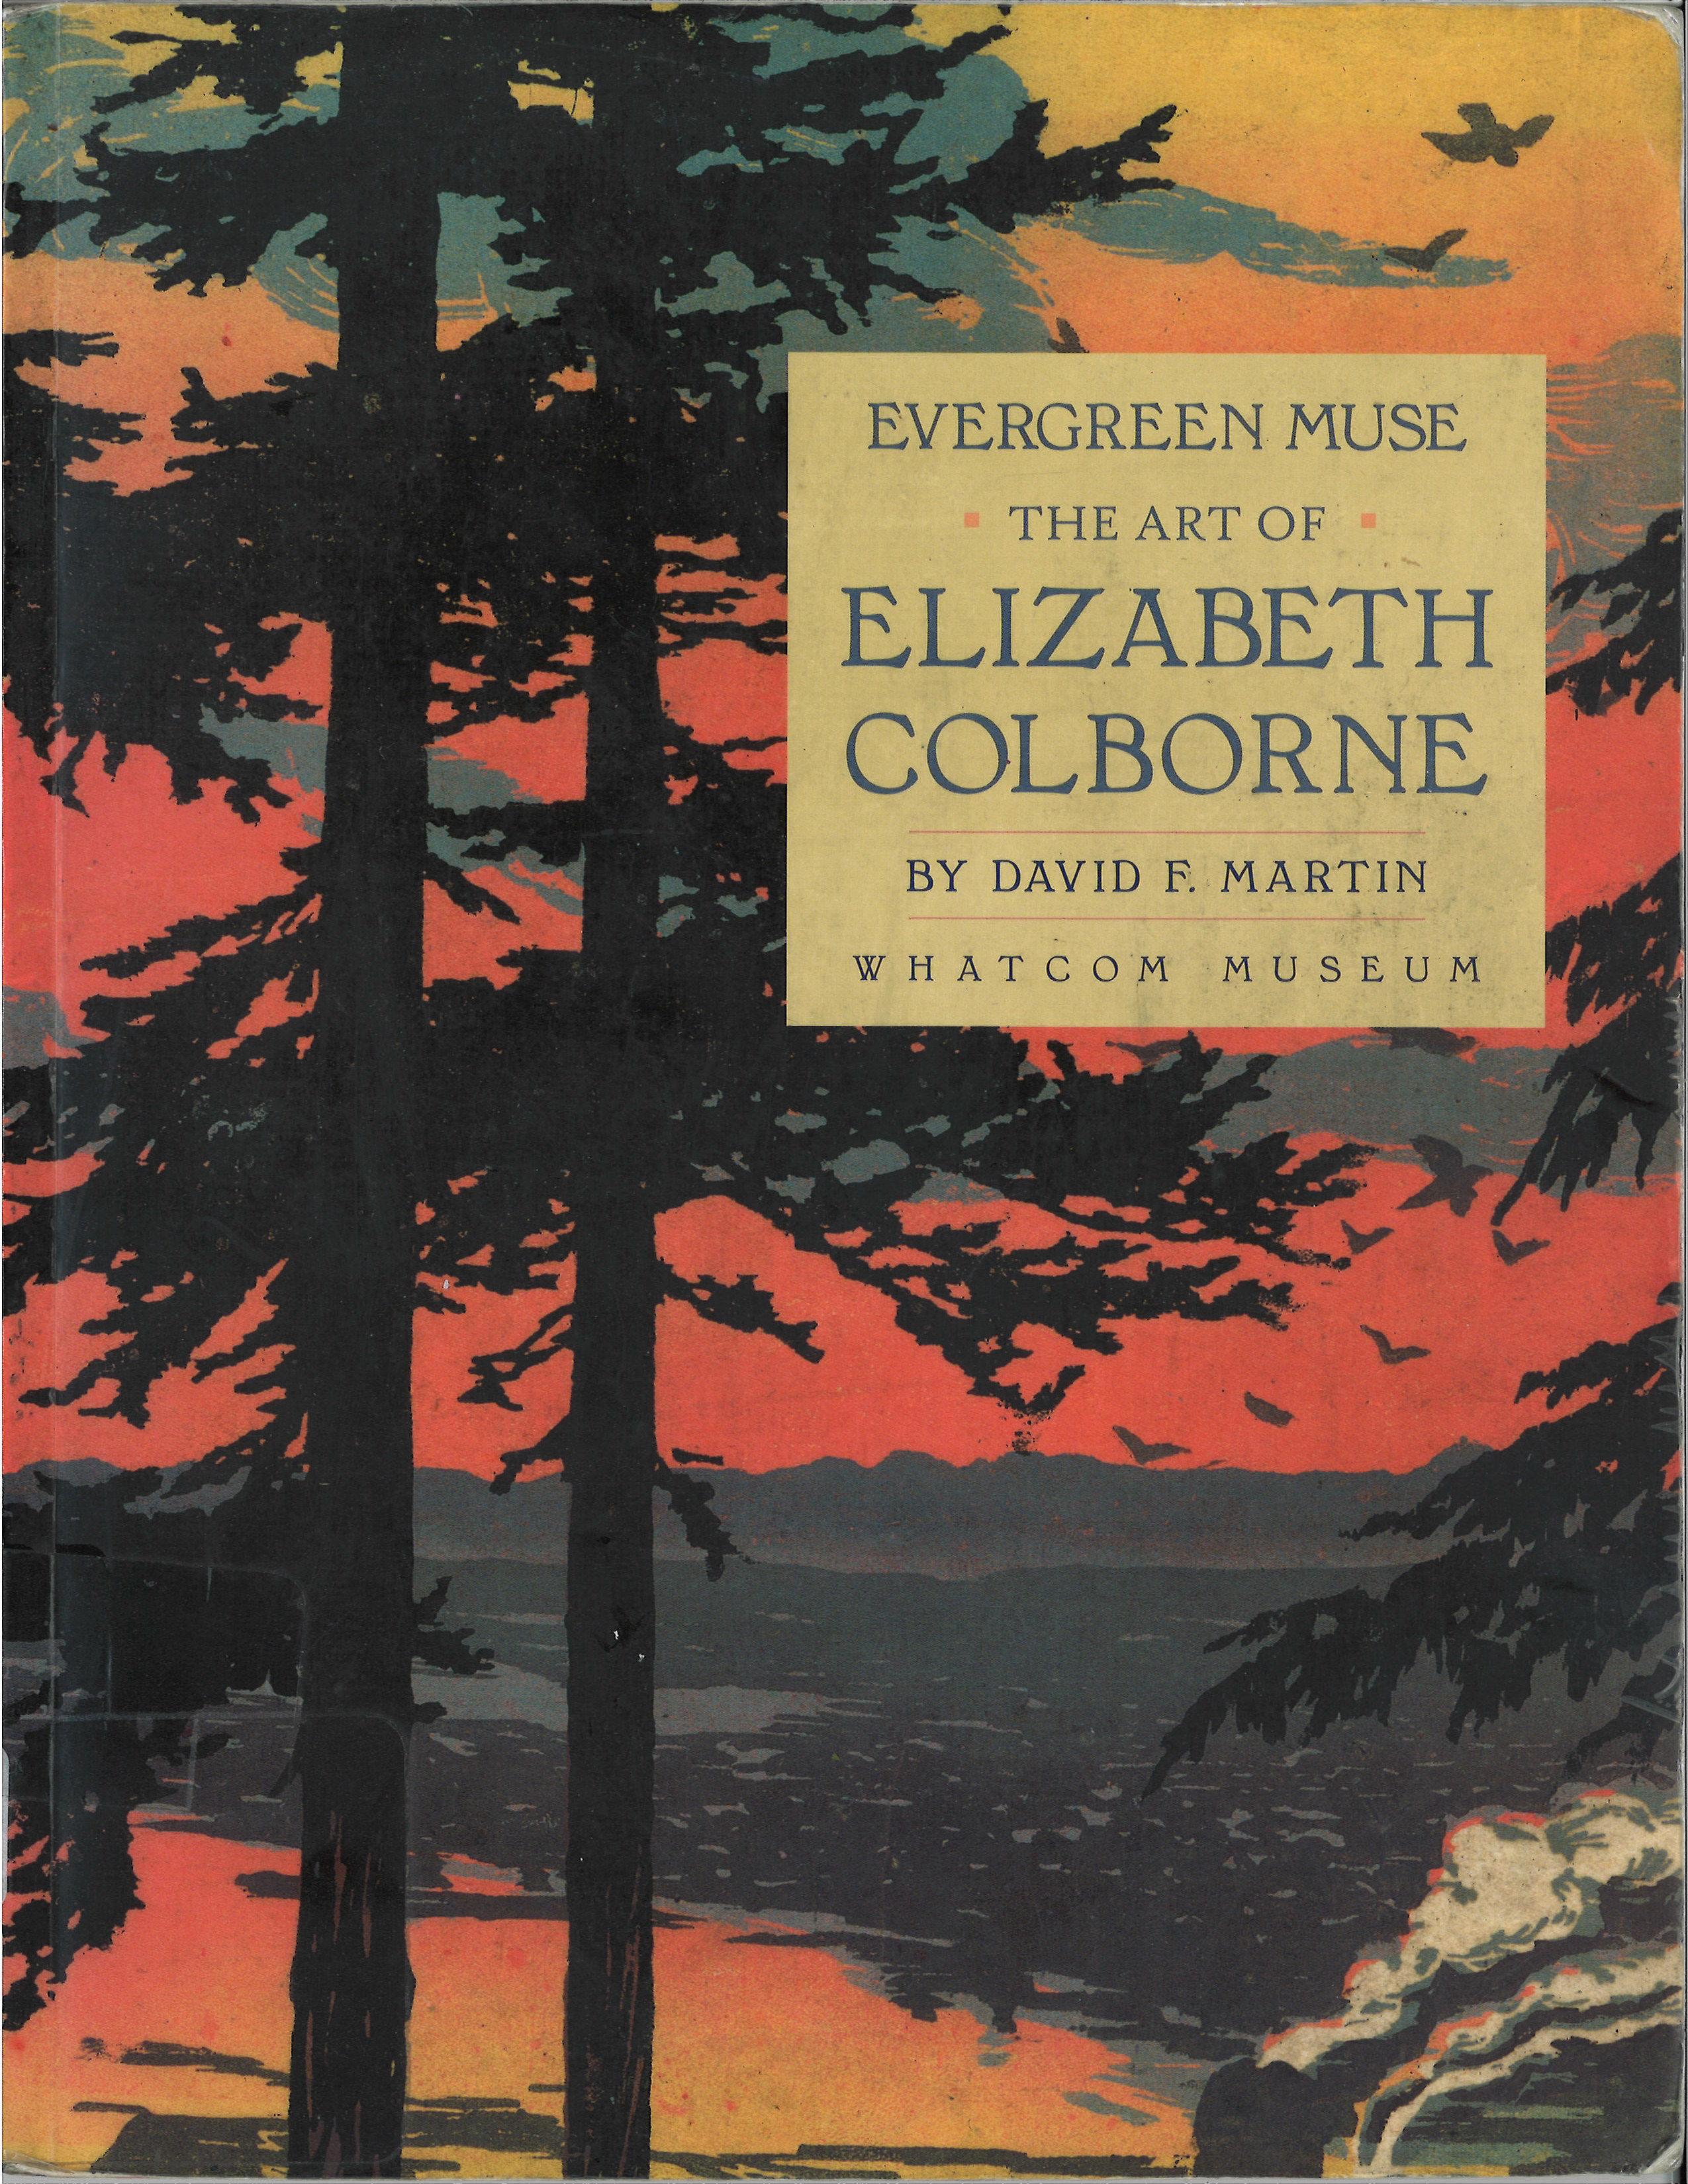 Evergreen Muse: The Art of Elizabeth Colborne